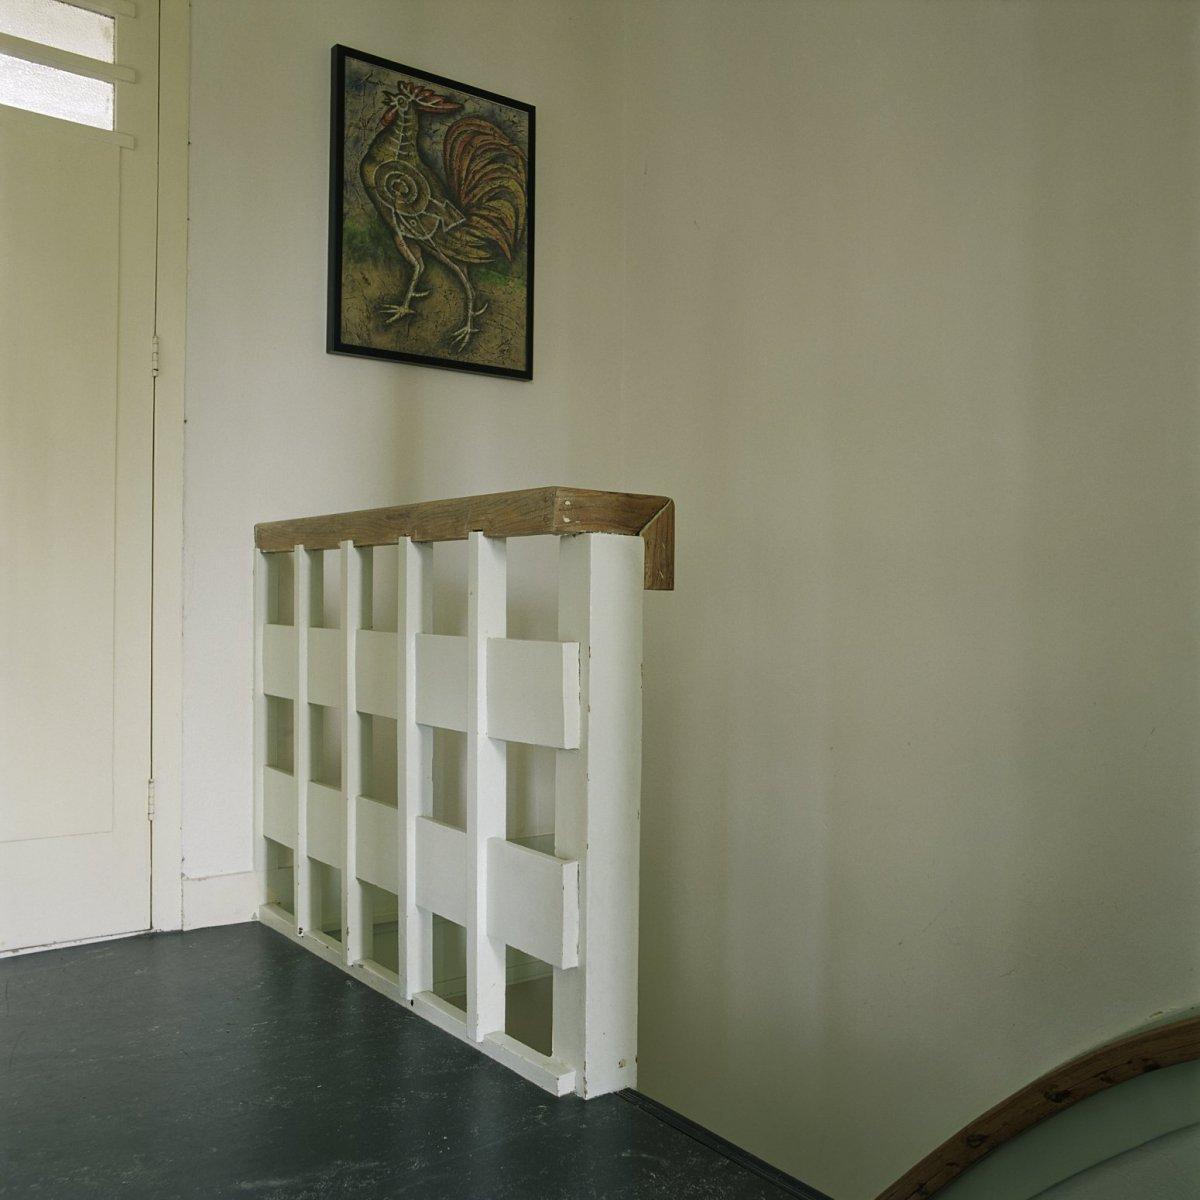 File interieur balustrade van de trap op de tweede for Balustrade trap